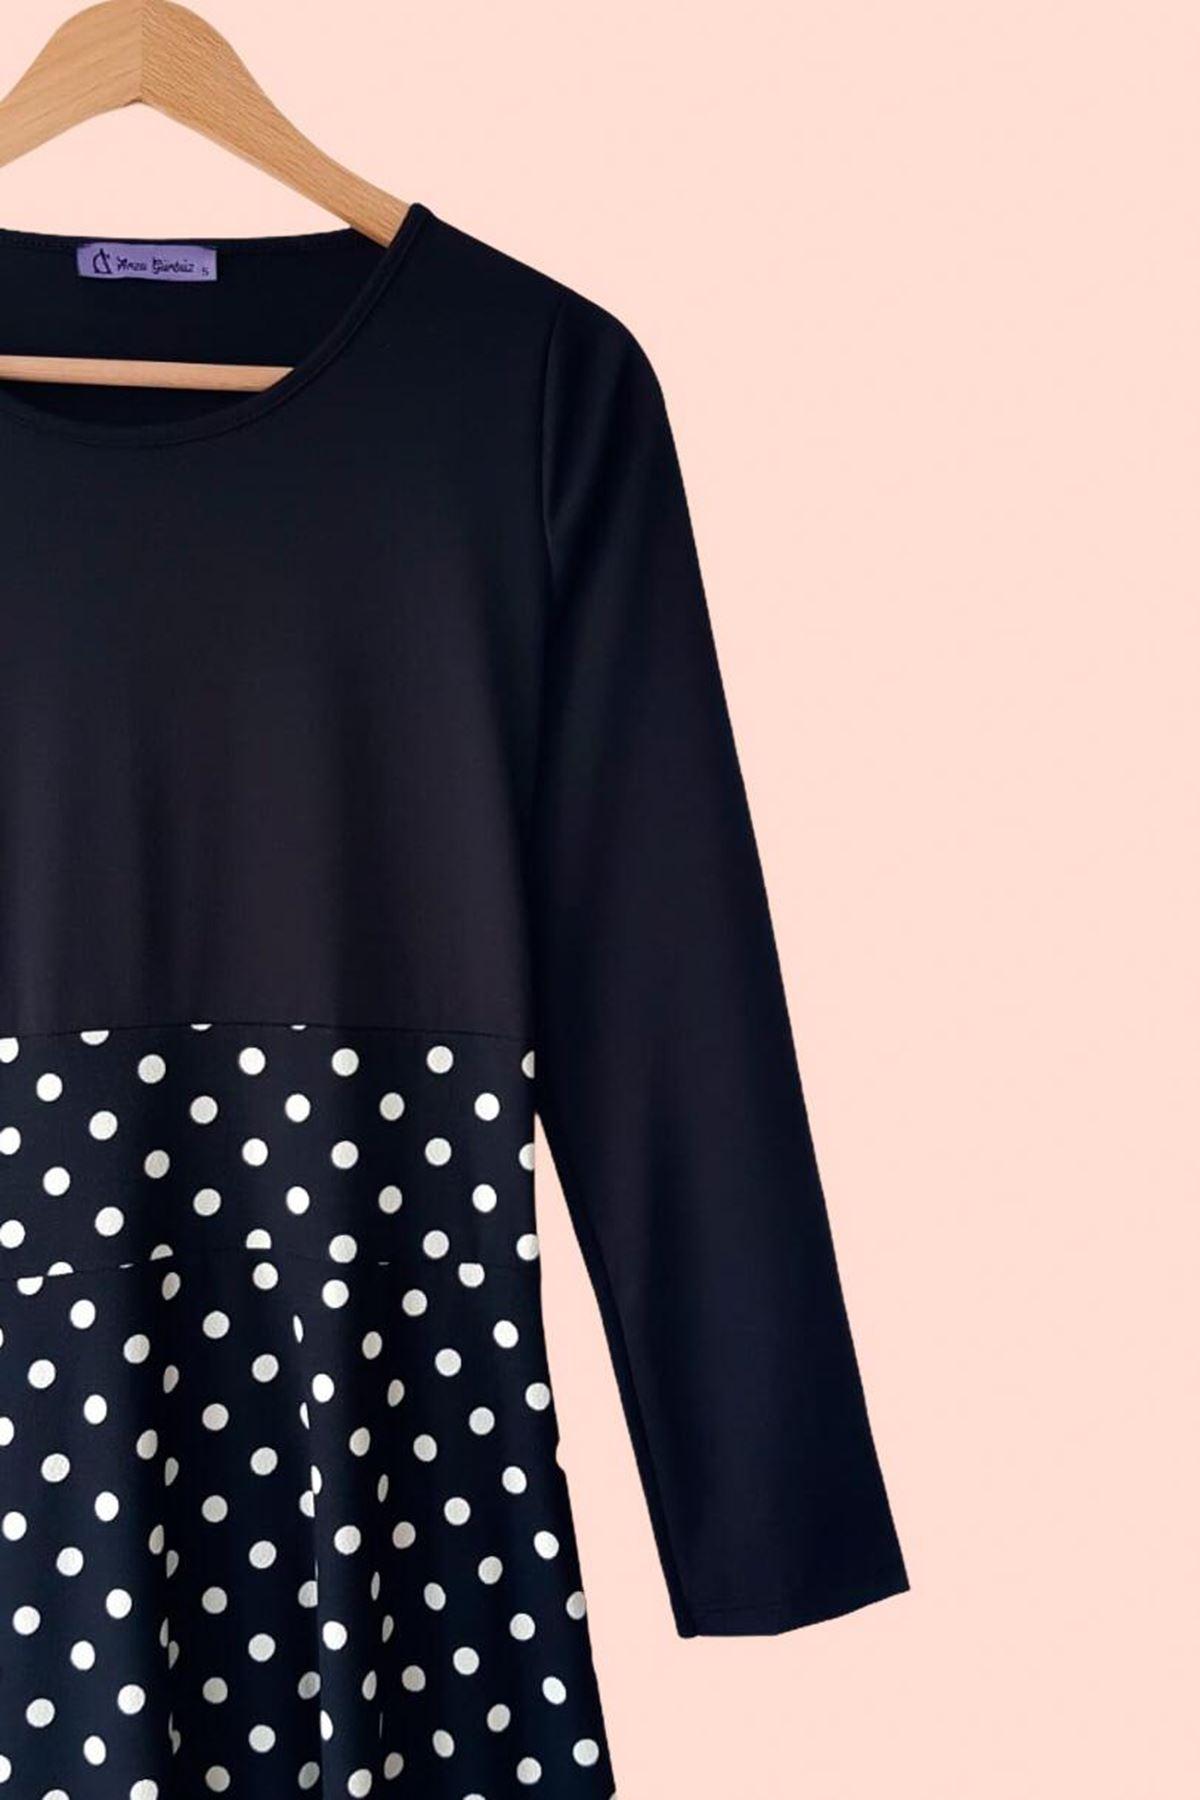 Uzun Kol Puanlı Maxi Elbise - SİYAH